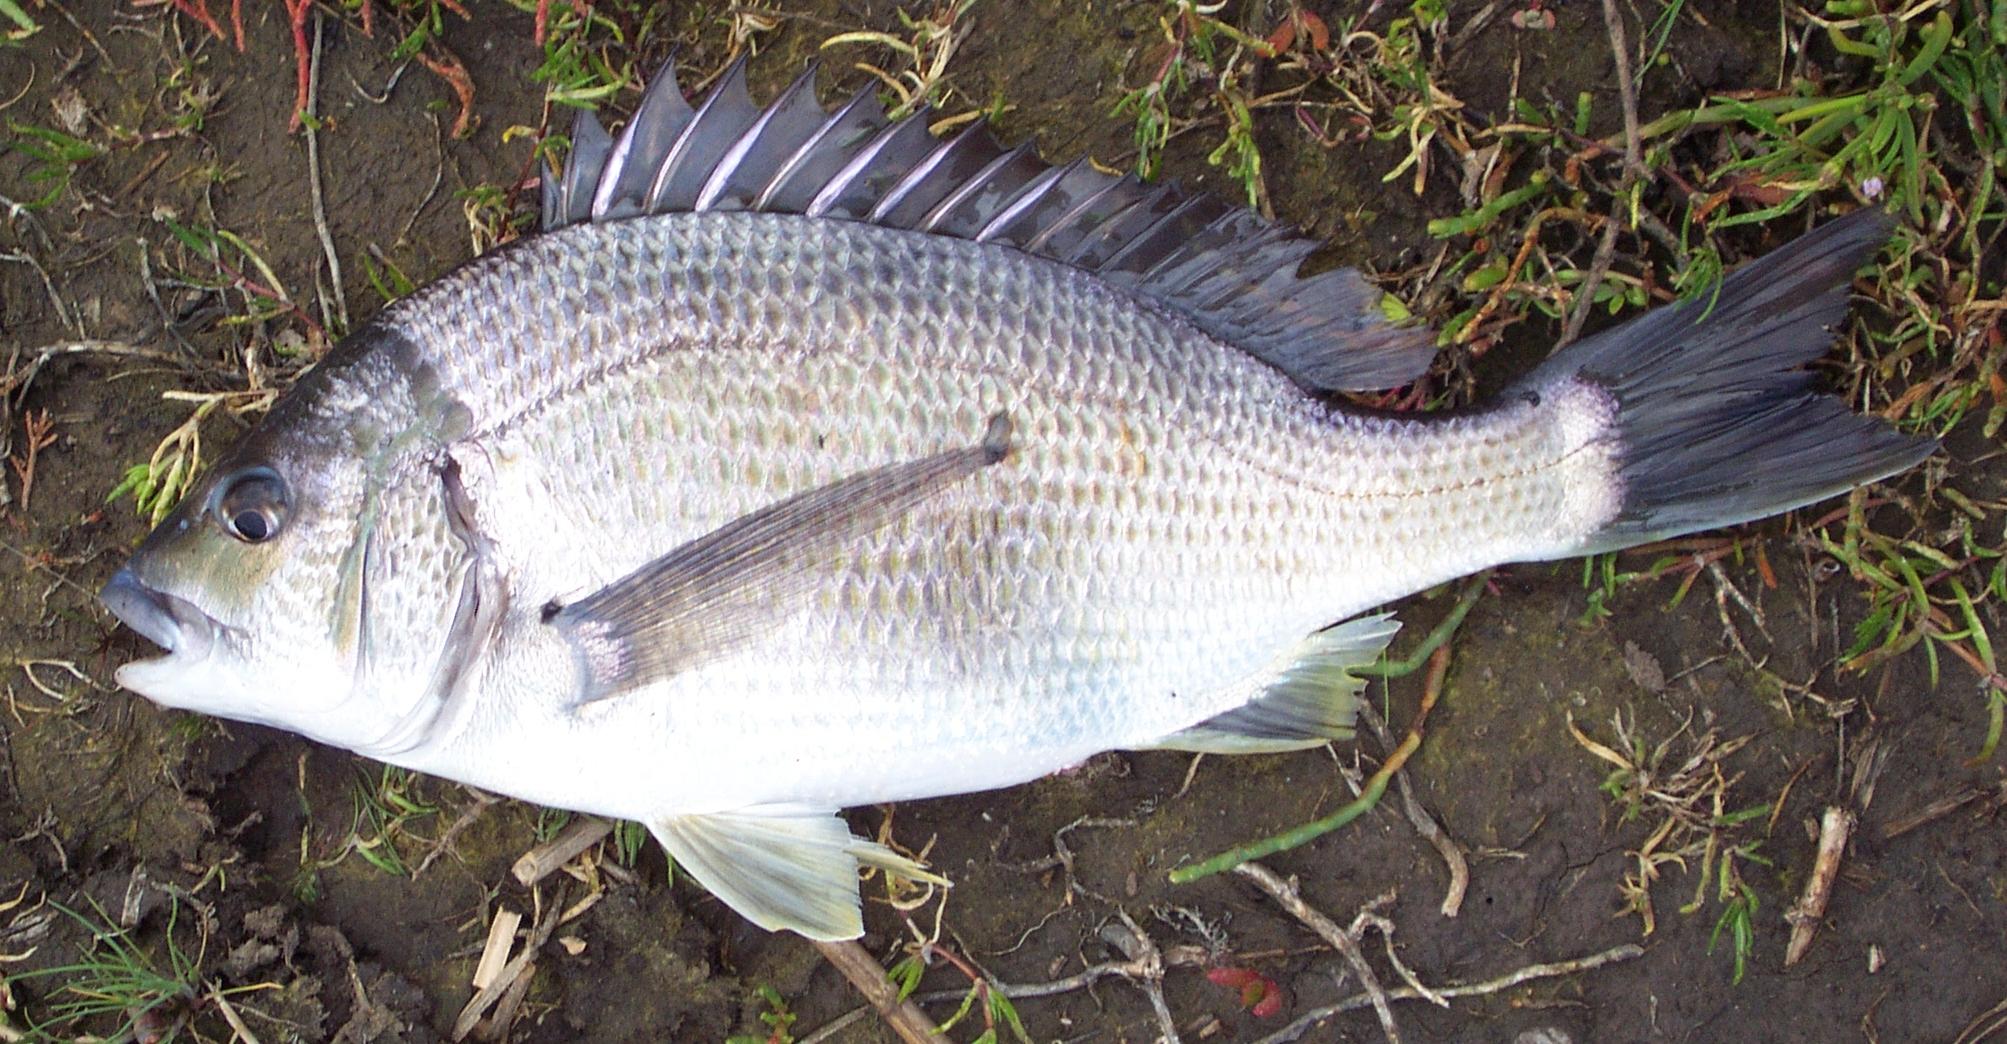 Freshwater fish bream - Freshwater Fish Bream